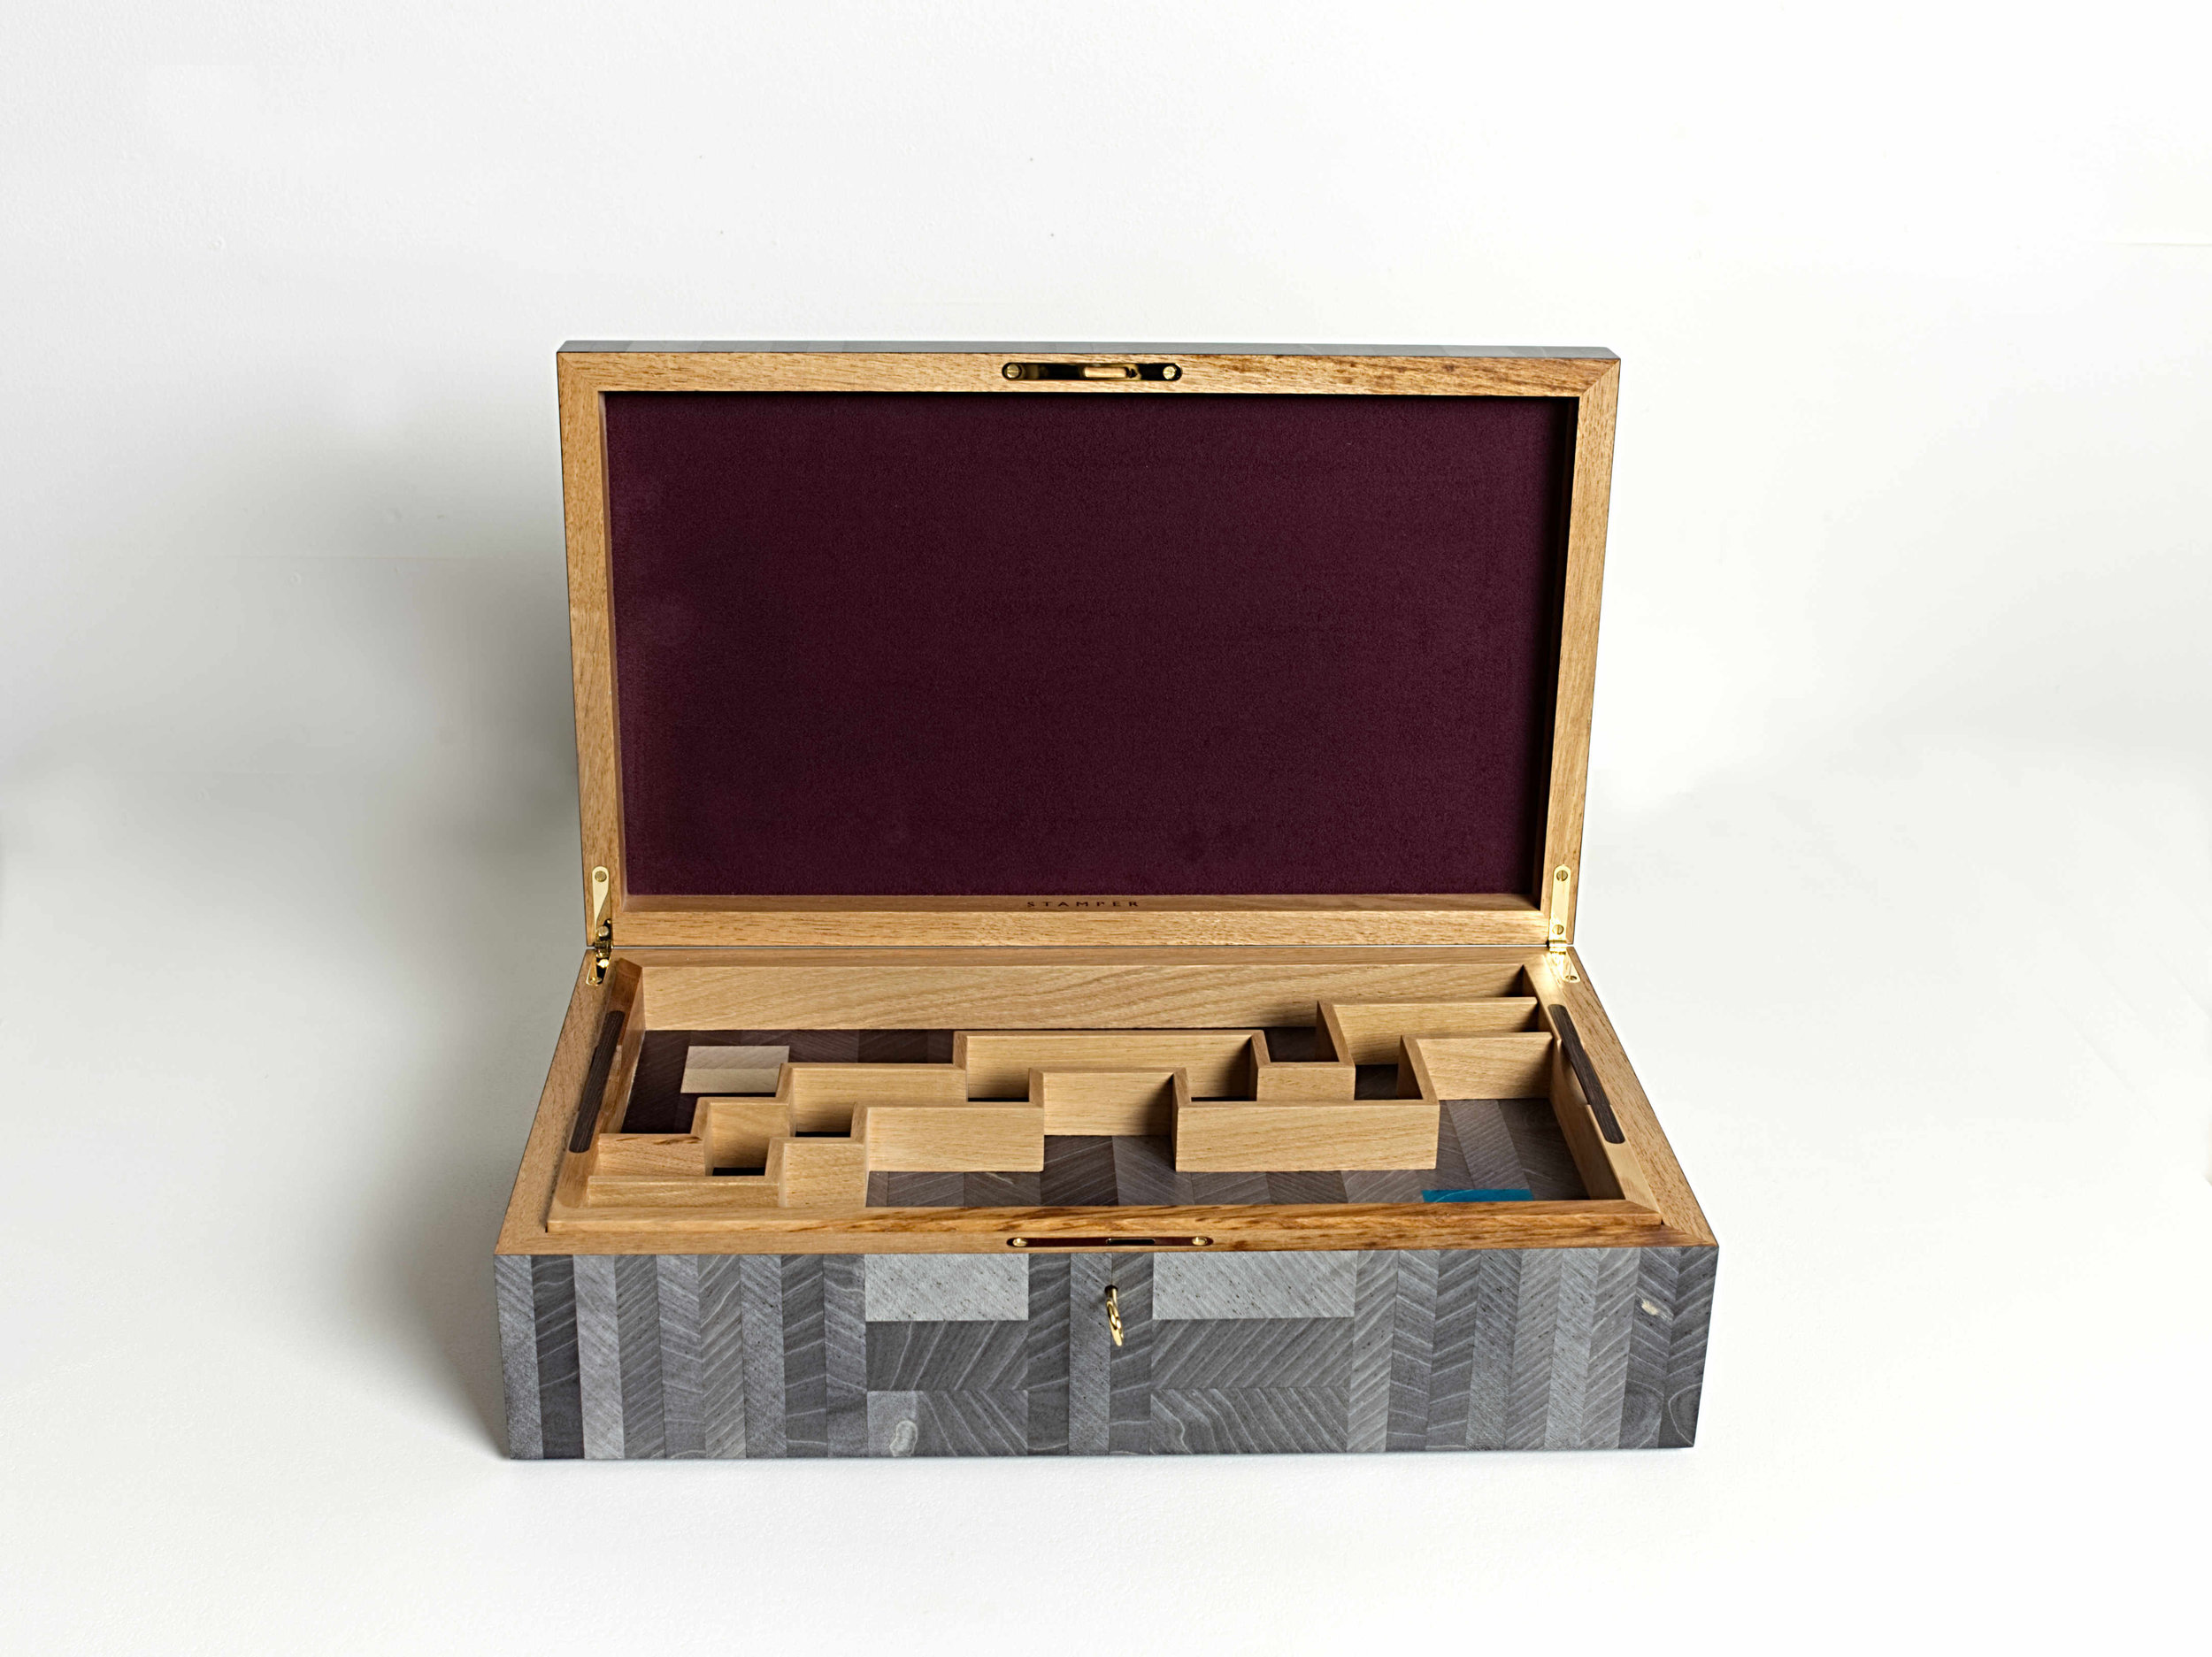 Cadir Idris jewellery box